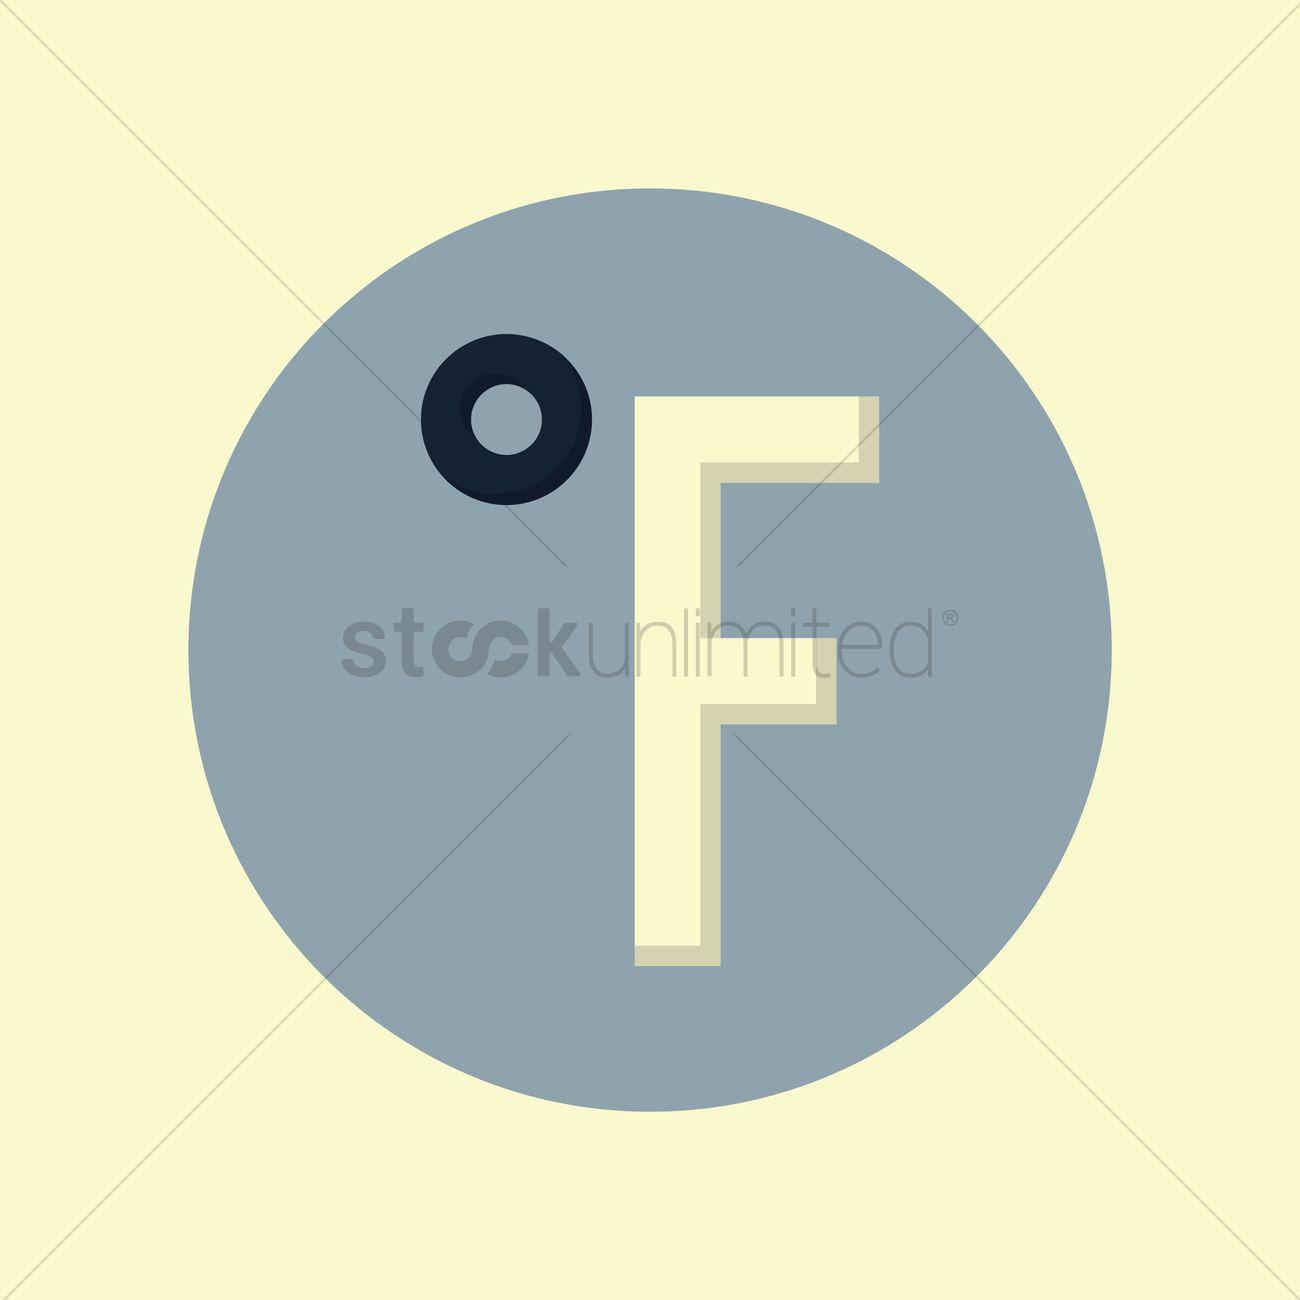 Fahrenheit symbol vector image 1333503 stockunlimited fahrenheit symbol vector graphic biocorpaavc Choice Image